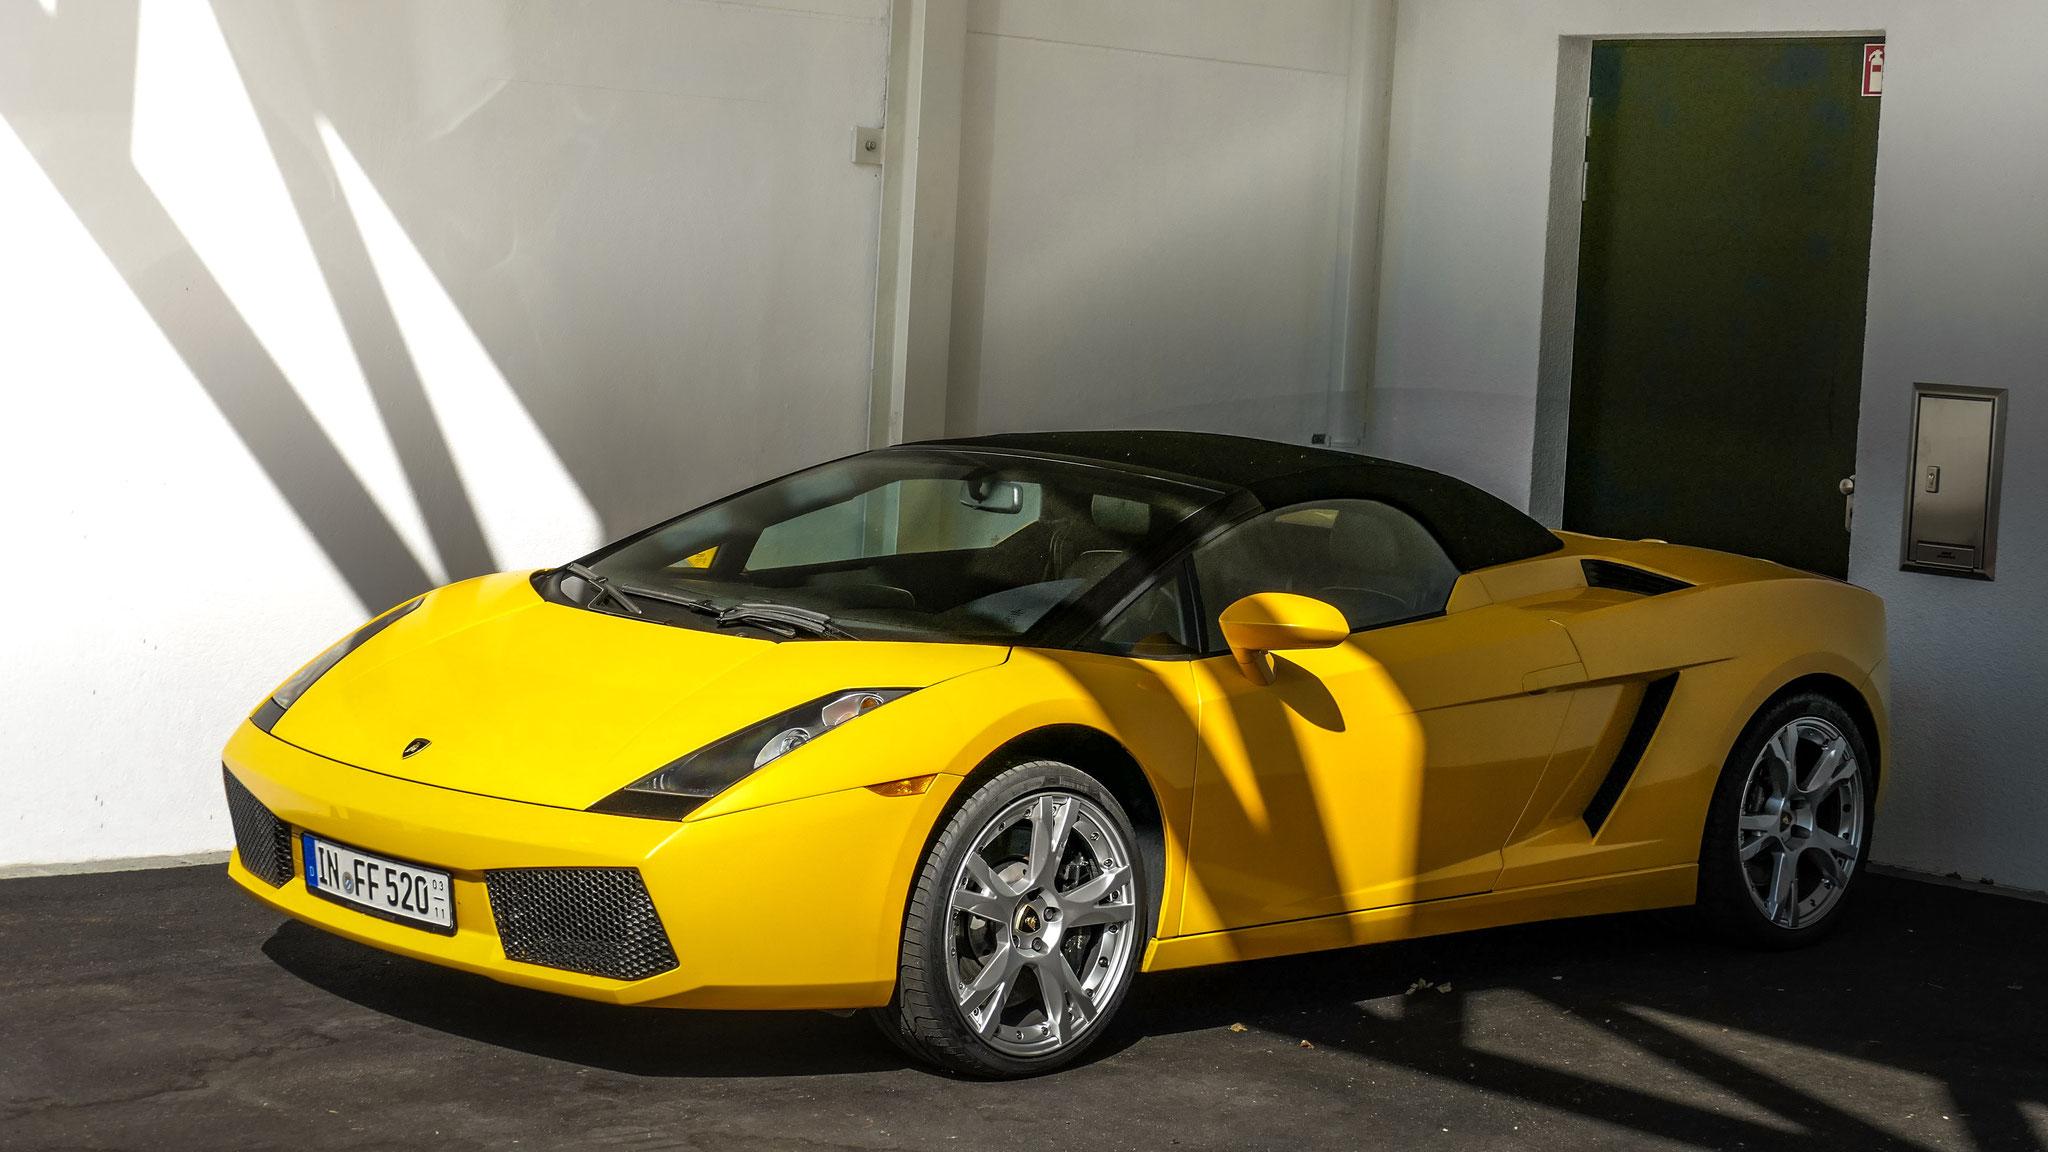 Lamborghini Gallardo Spyder - IN-FF-520